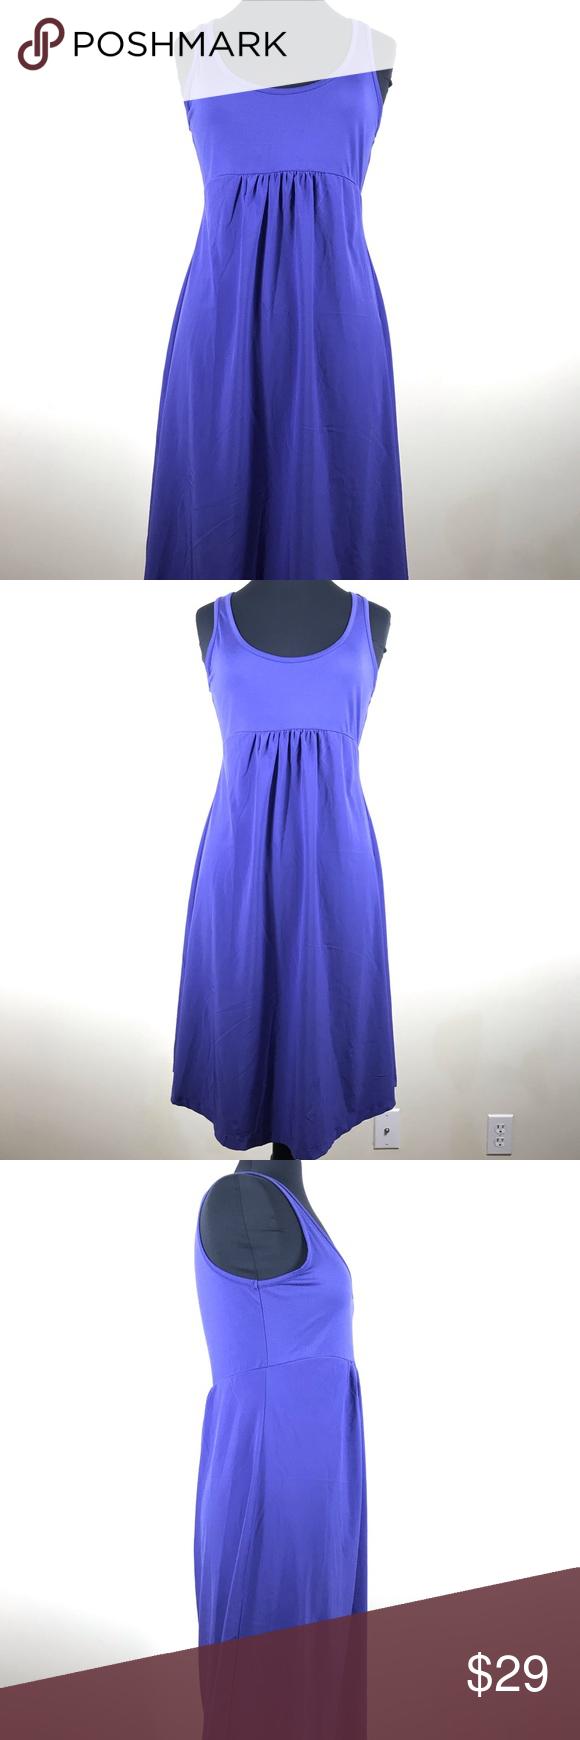 96379f69fa4 Columbia Marakesh Maven Omni Shade Dress Columbia Marakesh Maven Omni Shade Dress  Columbia Dresses Mini